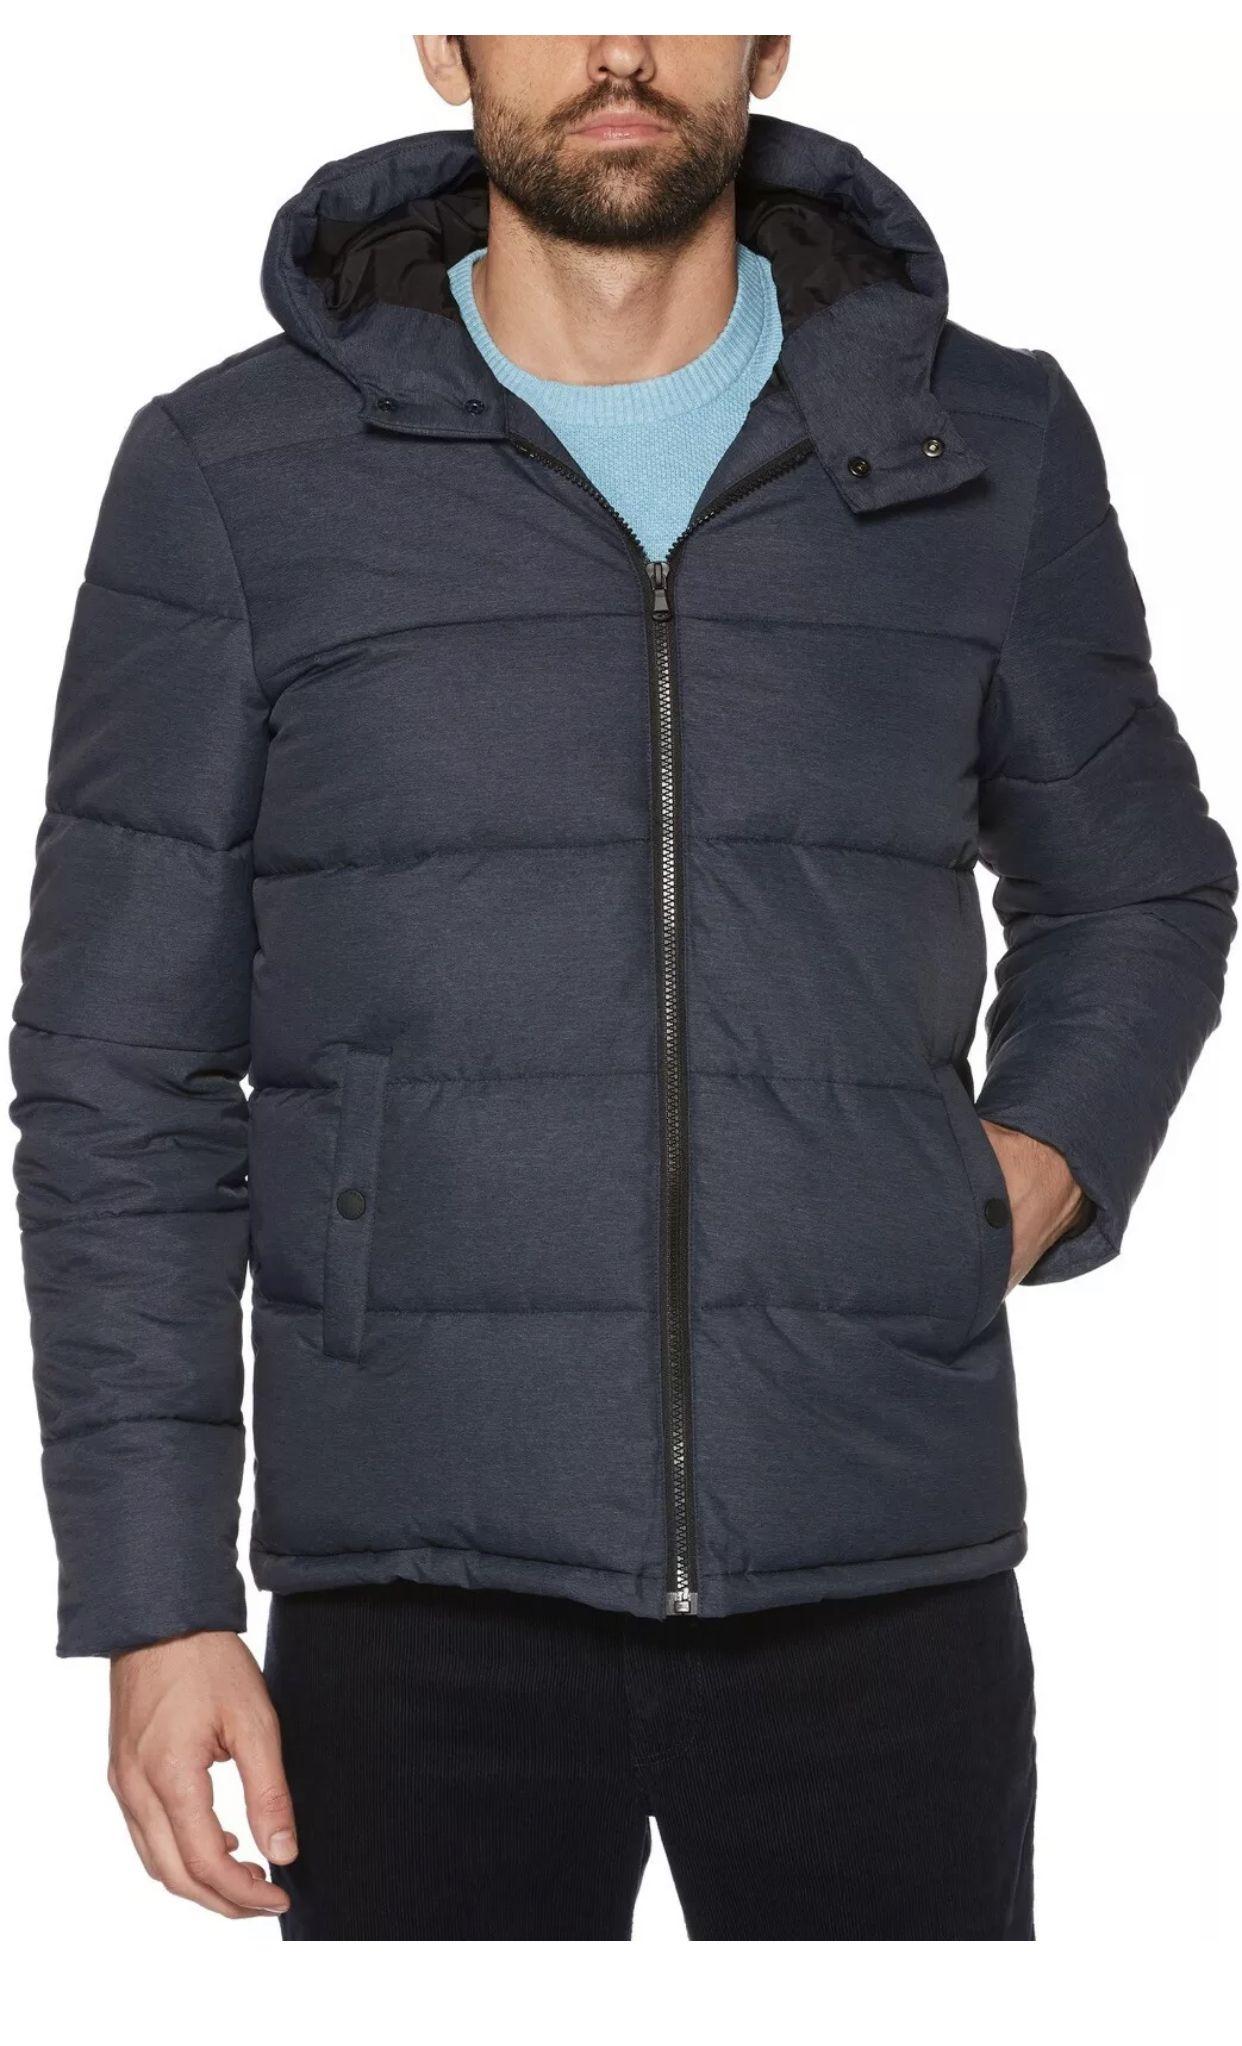 New Original Penguin 2xl Insulated Melange Puffer Jacket Mens Coat Msrp 150 Nwt Winter Jackets Puffer Jackets Winter Puffer Jackets [ 2046 x 1242 Pixel ]